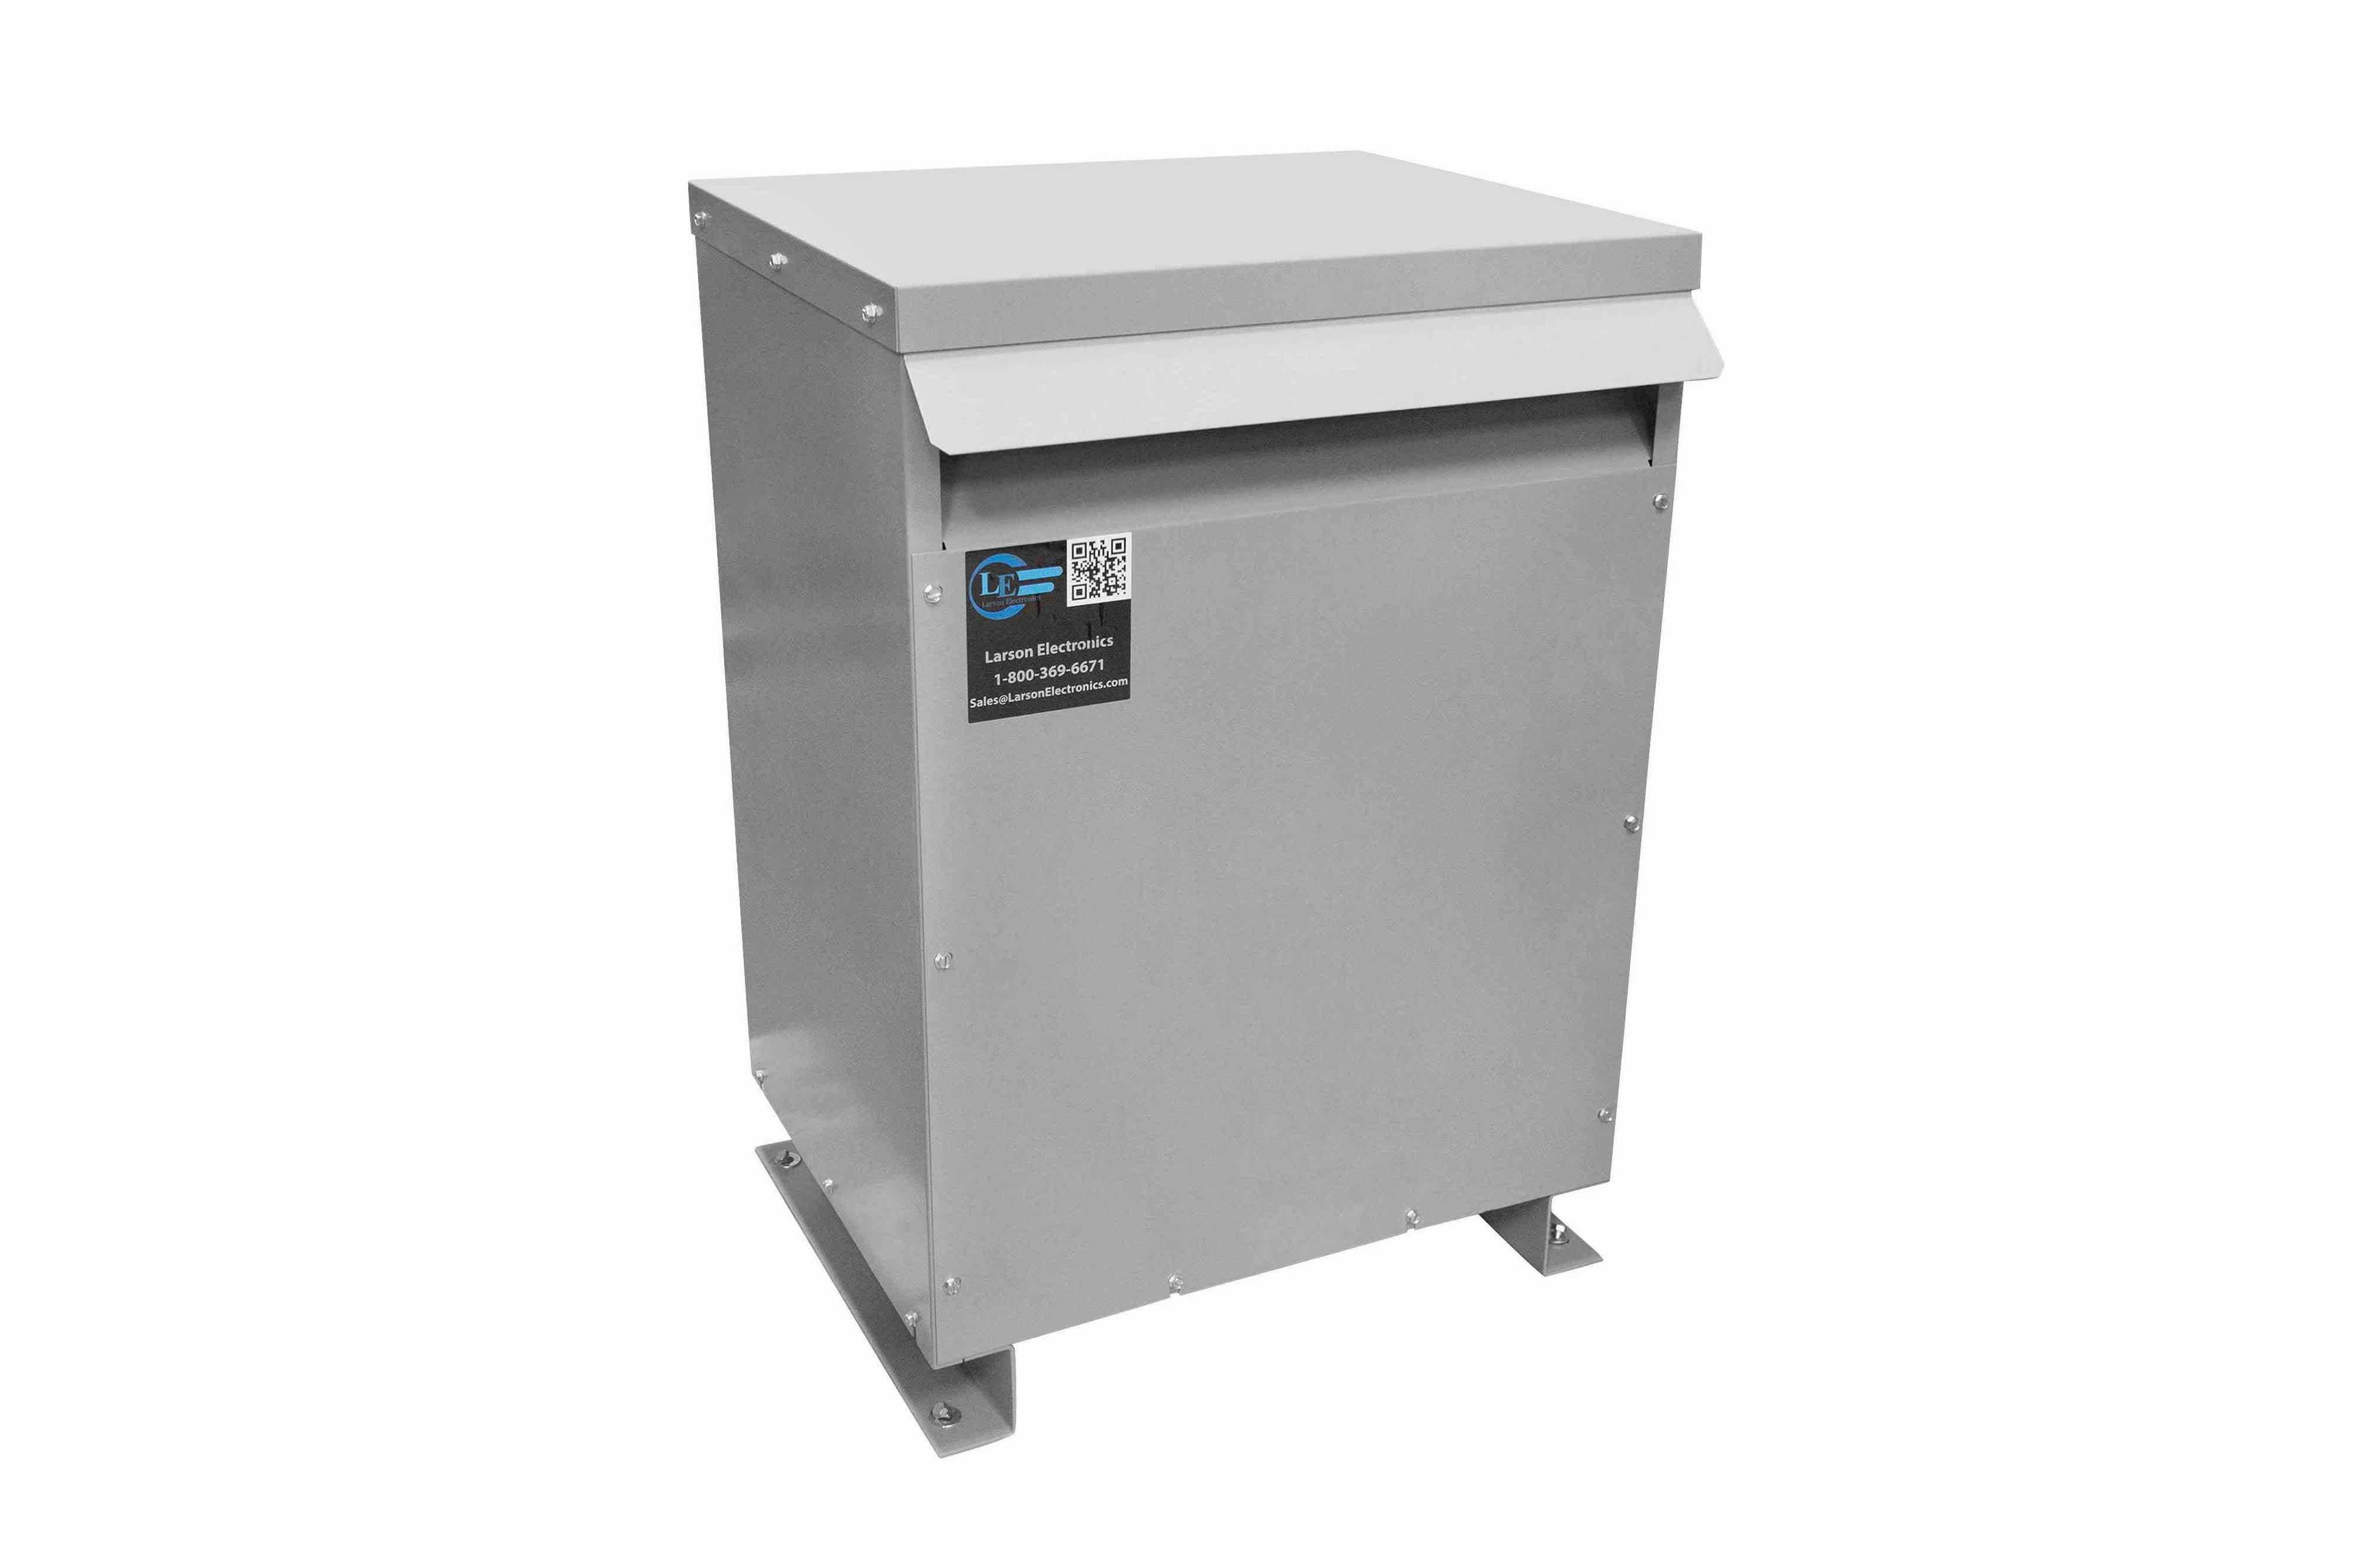 25 kVA 3PH Isolation Transformer, 208V Wye Primary, 600Y/347 Wye-N Secondary, N3R, Ventilated, 60 Hz